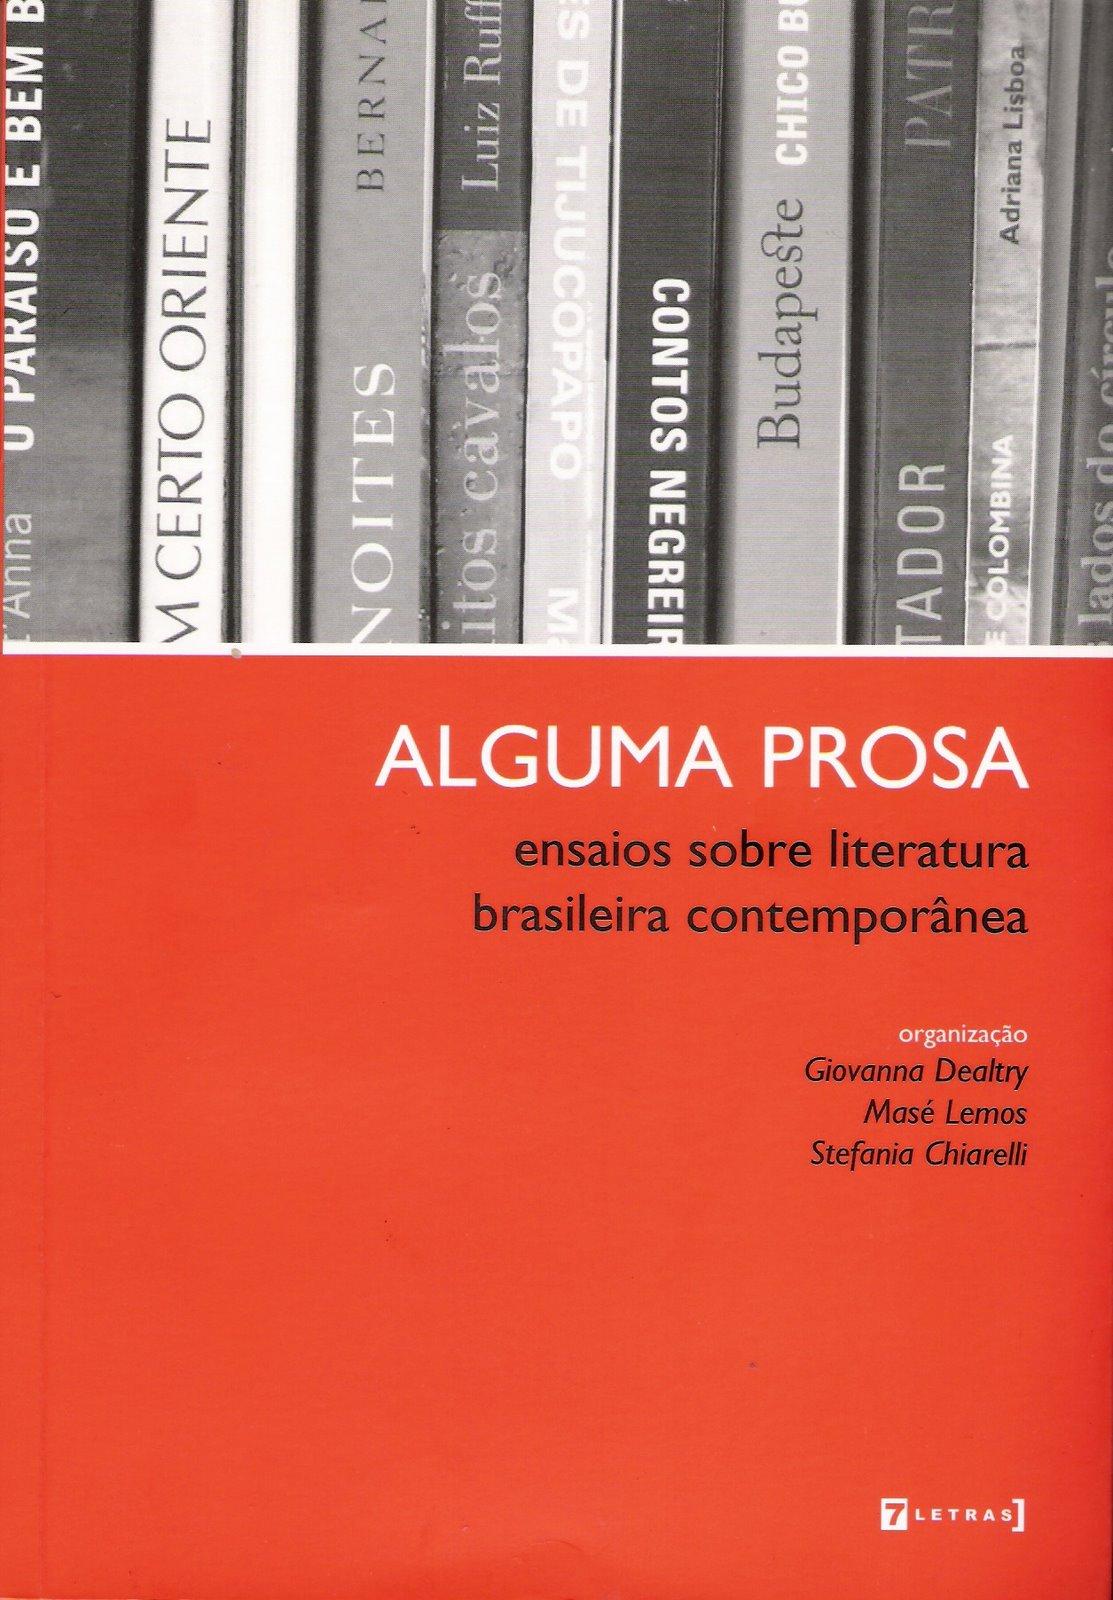 ALGUMA PROSA: ensaios sobre literatura brasileira contemporânea